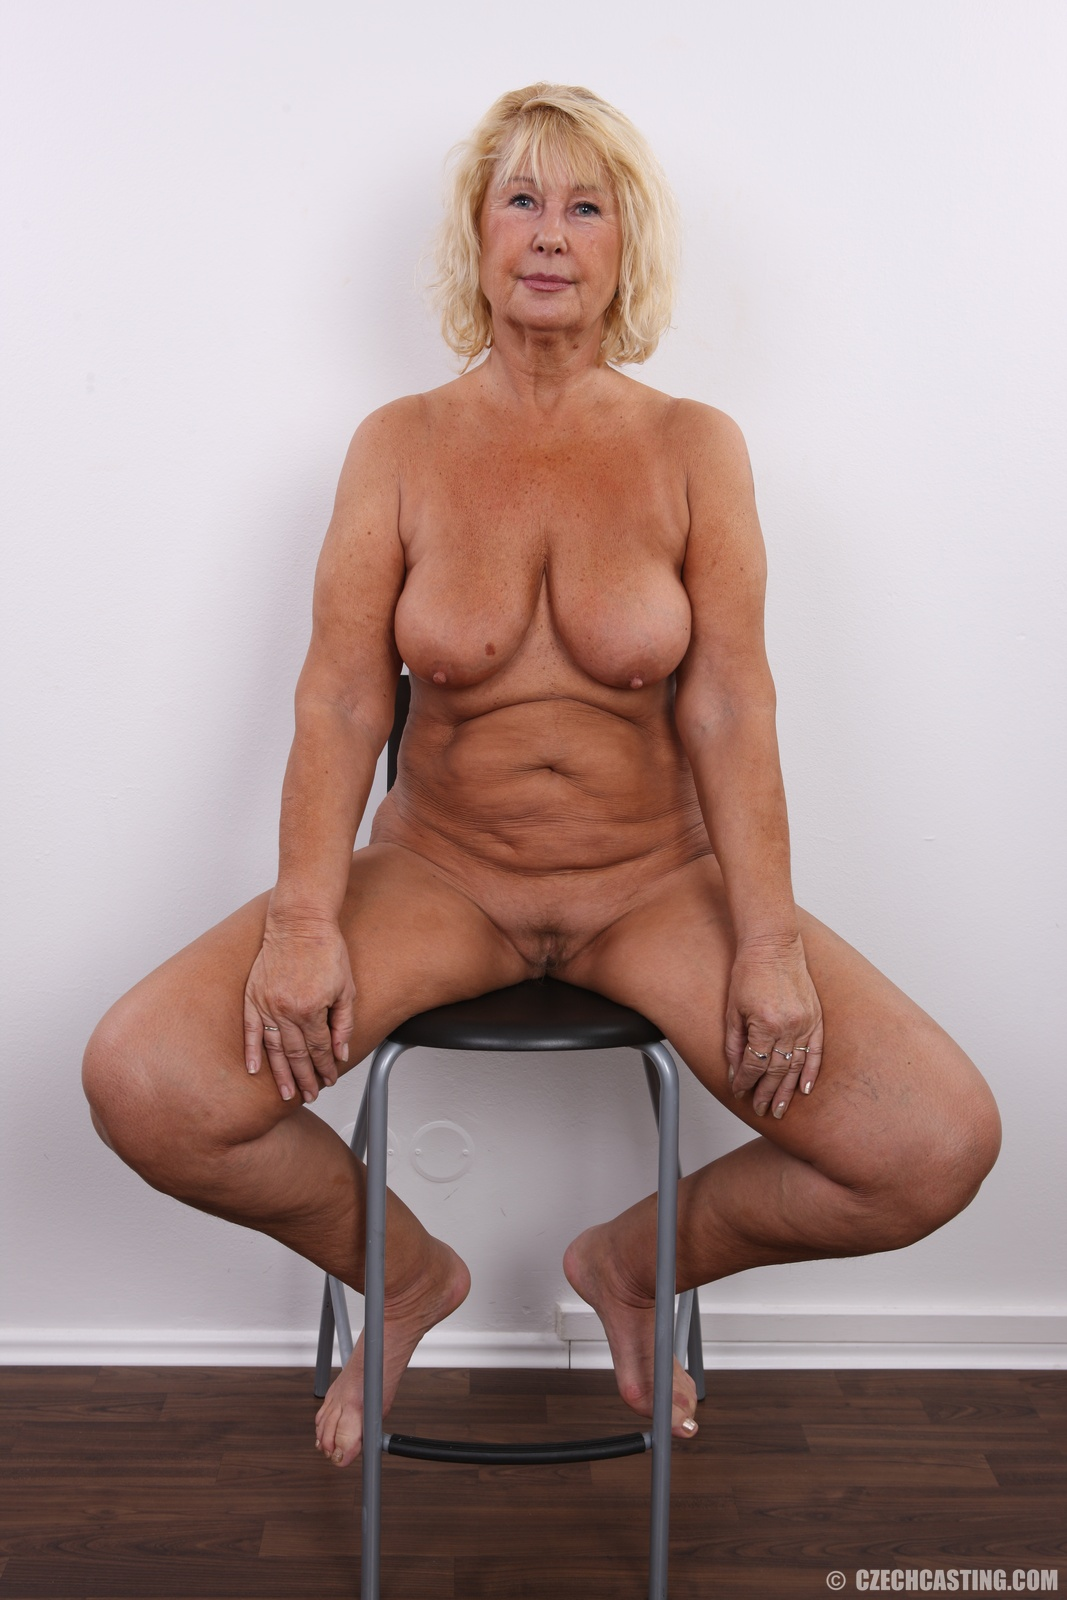 Зрелые тетки на порнокастинге